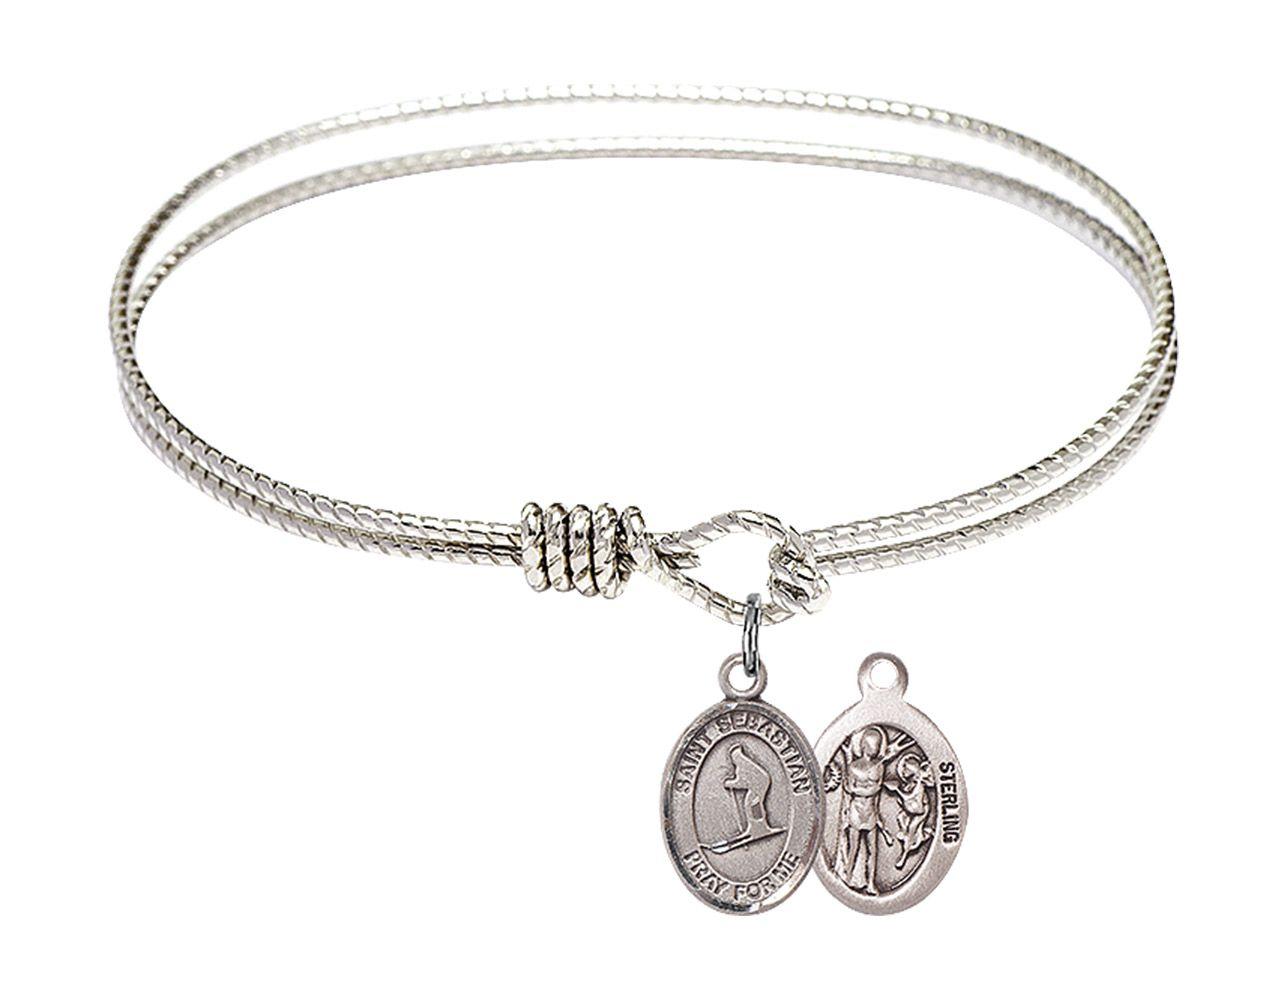 DiamondJewelryNY Double Loop Bangle Bracelet with a St Christopher//Skiing Charm.